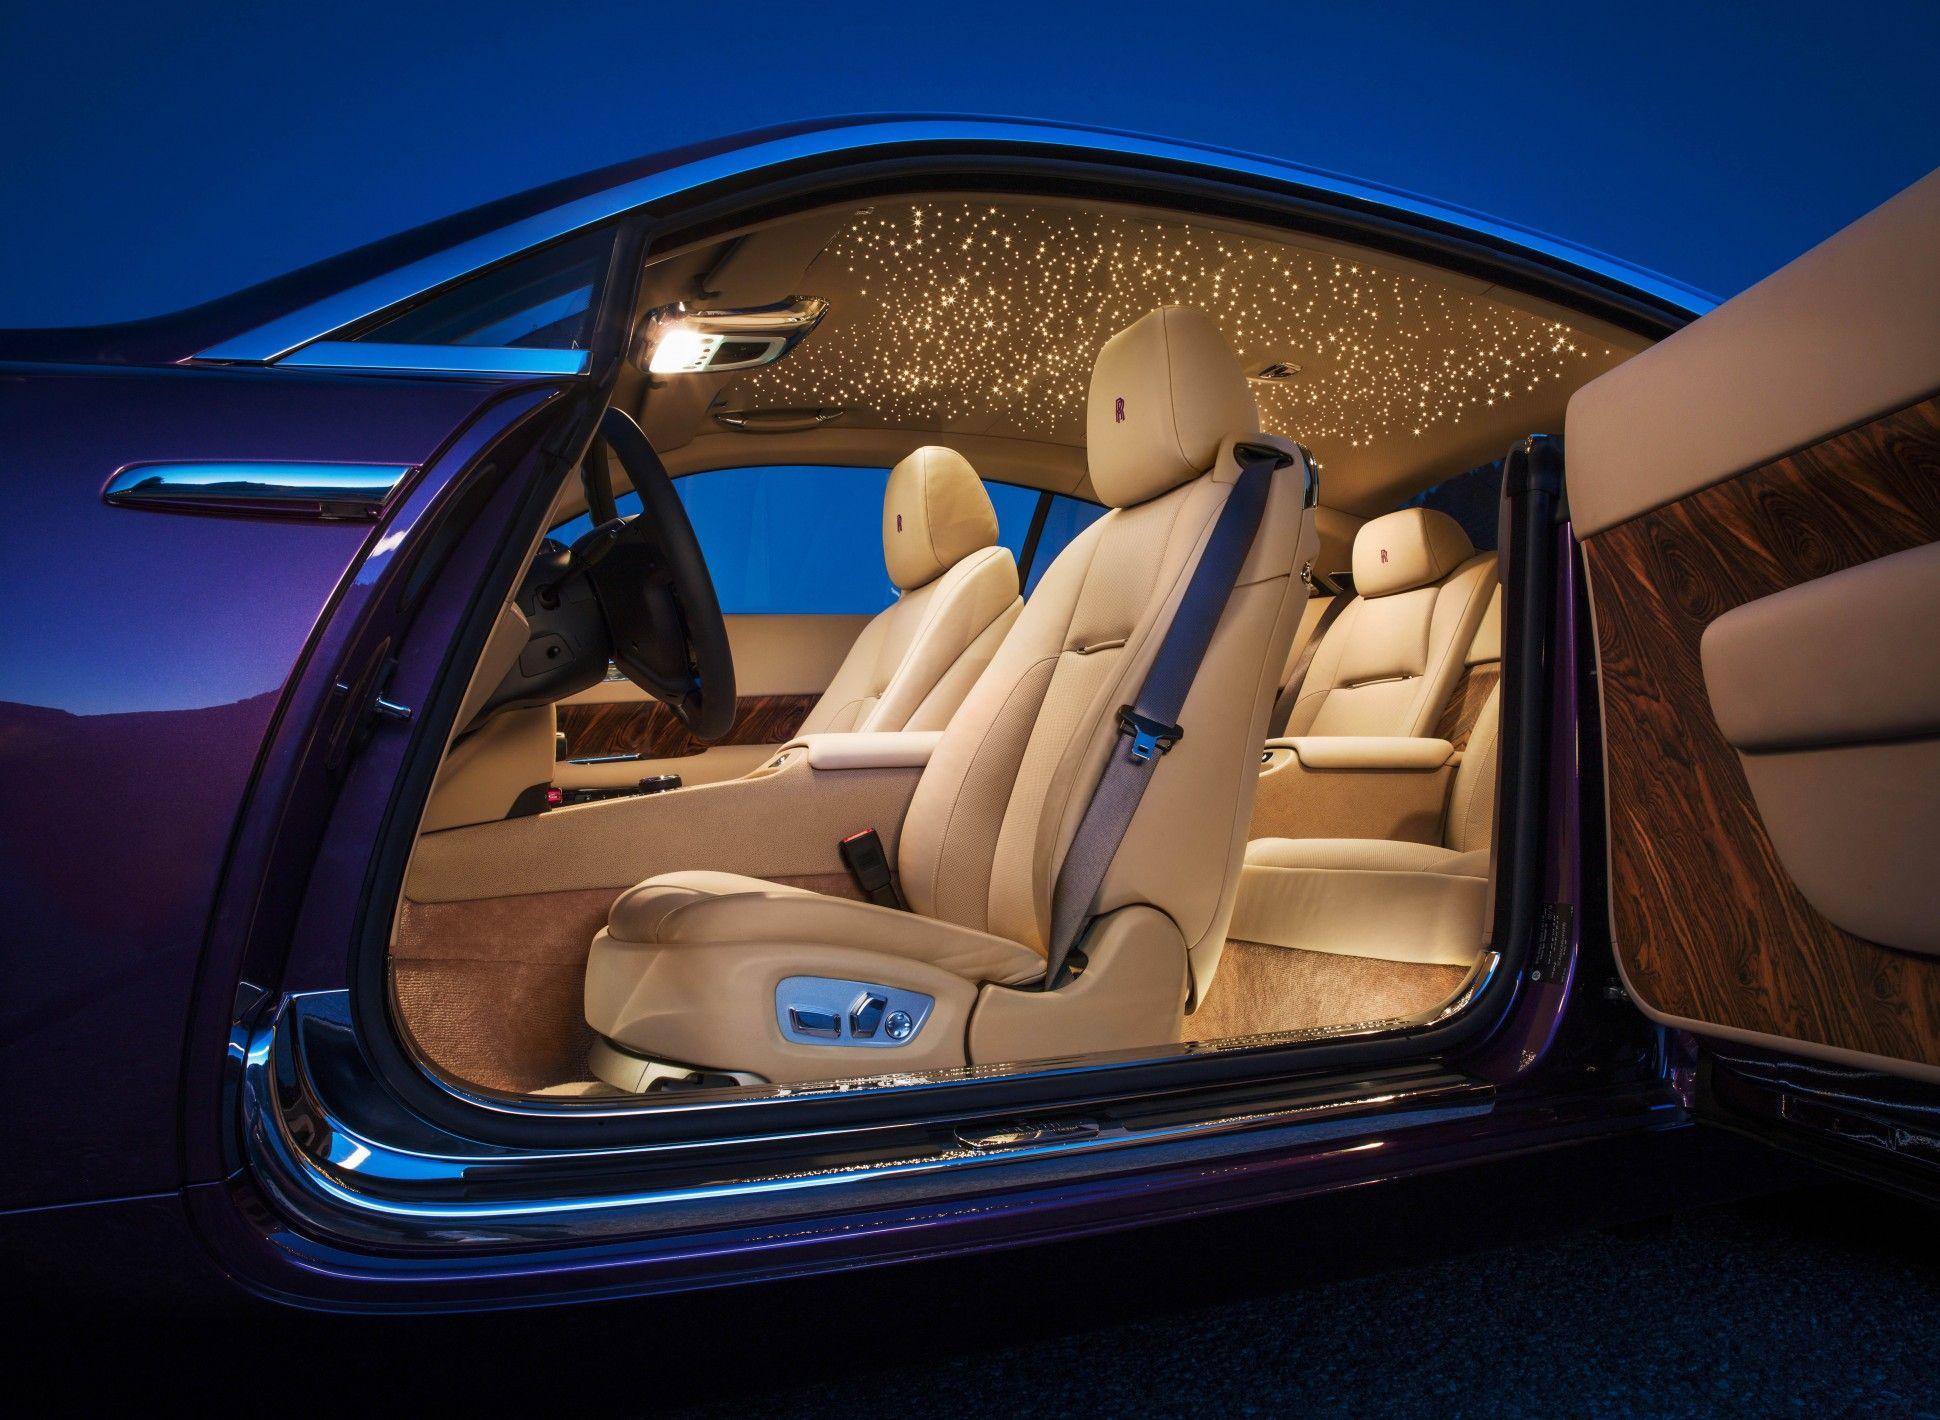 rolls royce 2015 interior. road testing the 2015 rollsroyce wraith a night at opera rolls royce interior